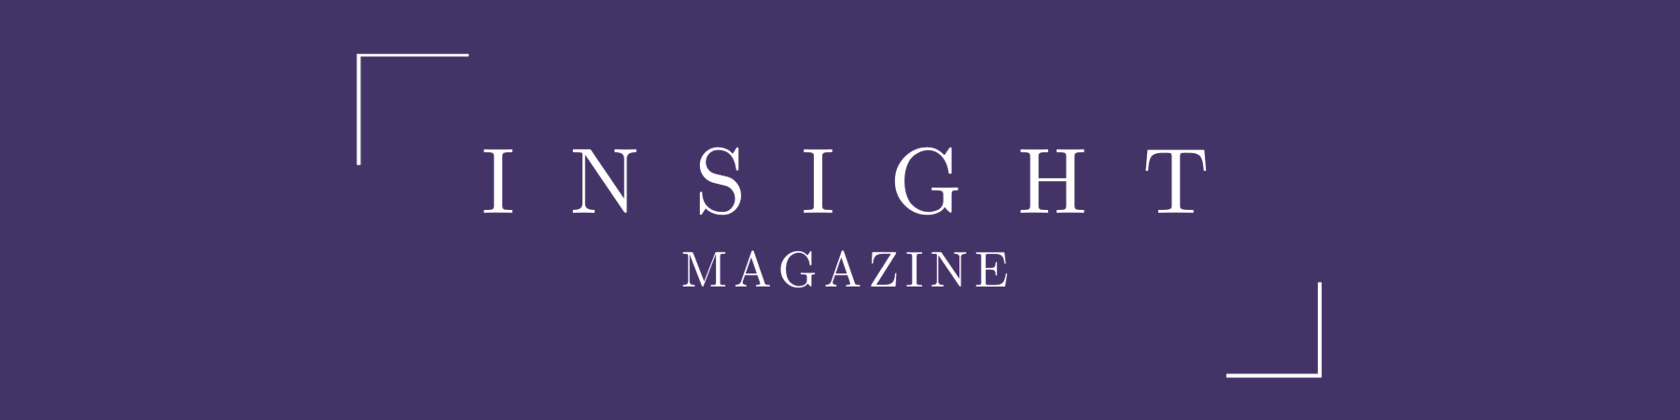 insight magazine, журнал о моде